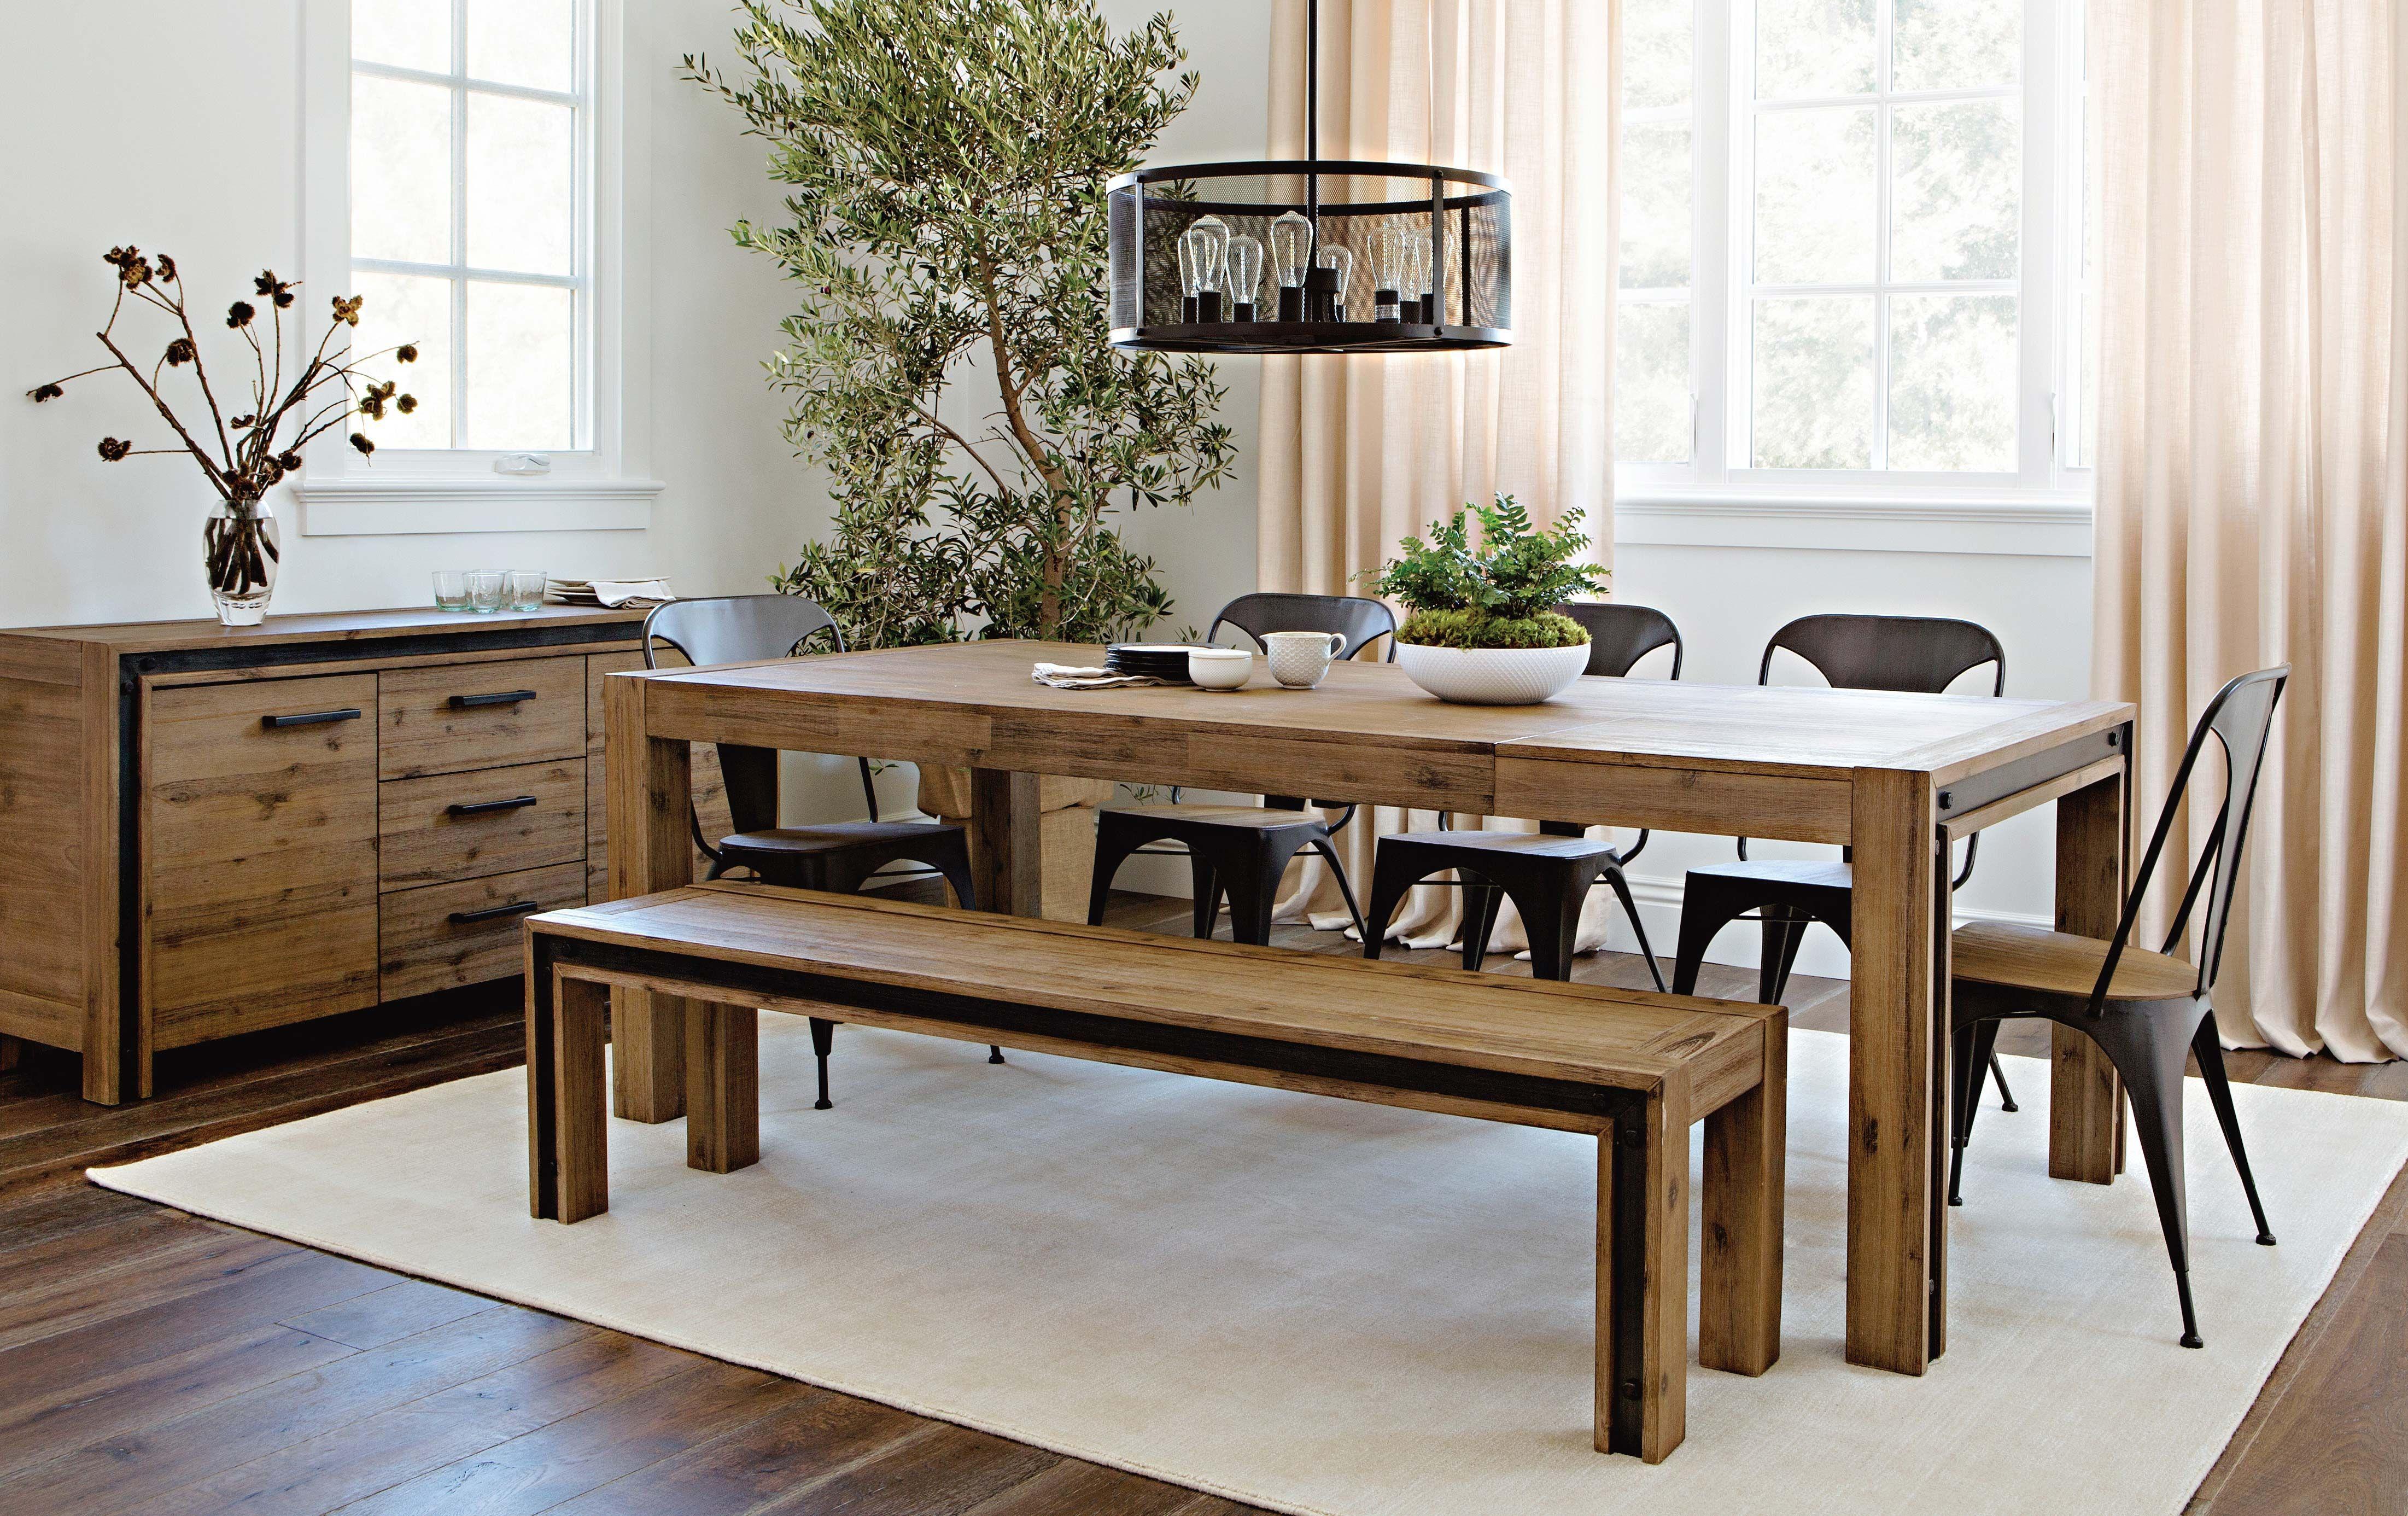 Cuccino Coffee Table Design Ideas